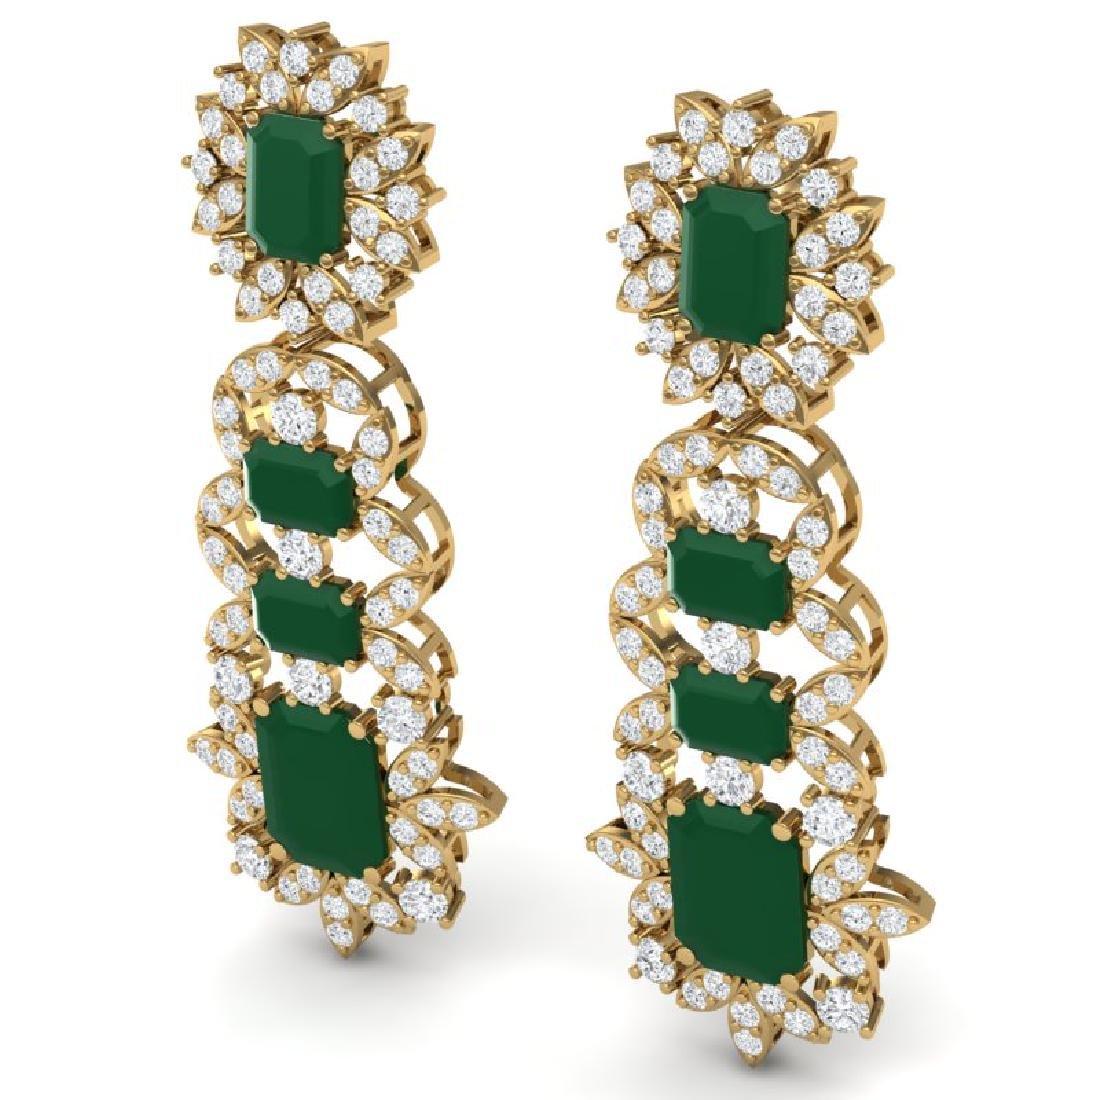 30.25 CTW Royalty Emerald & VS Diamond Earrings 18K - 2